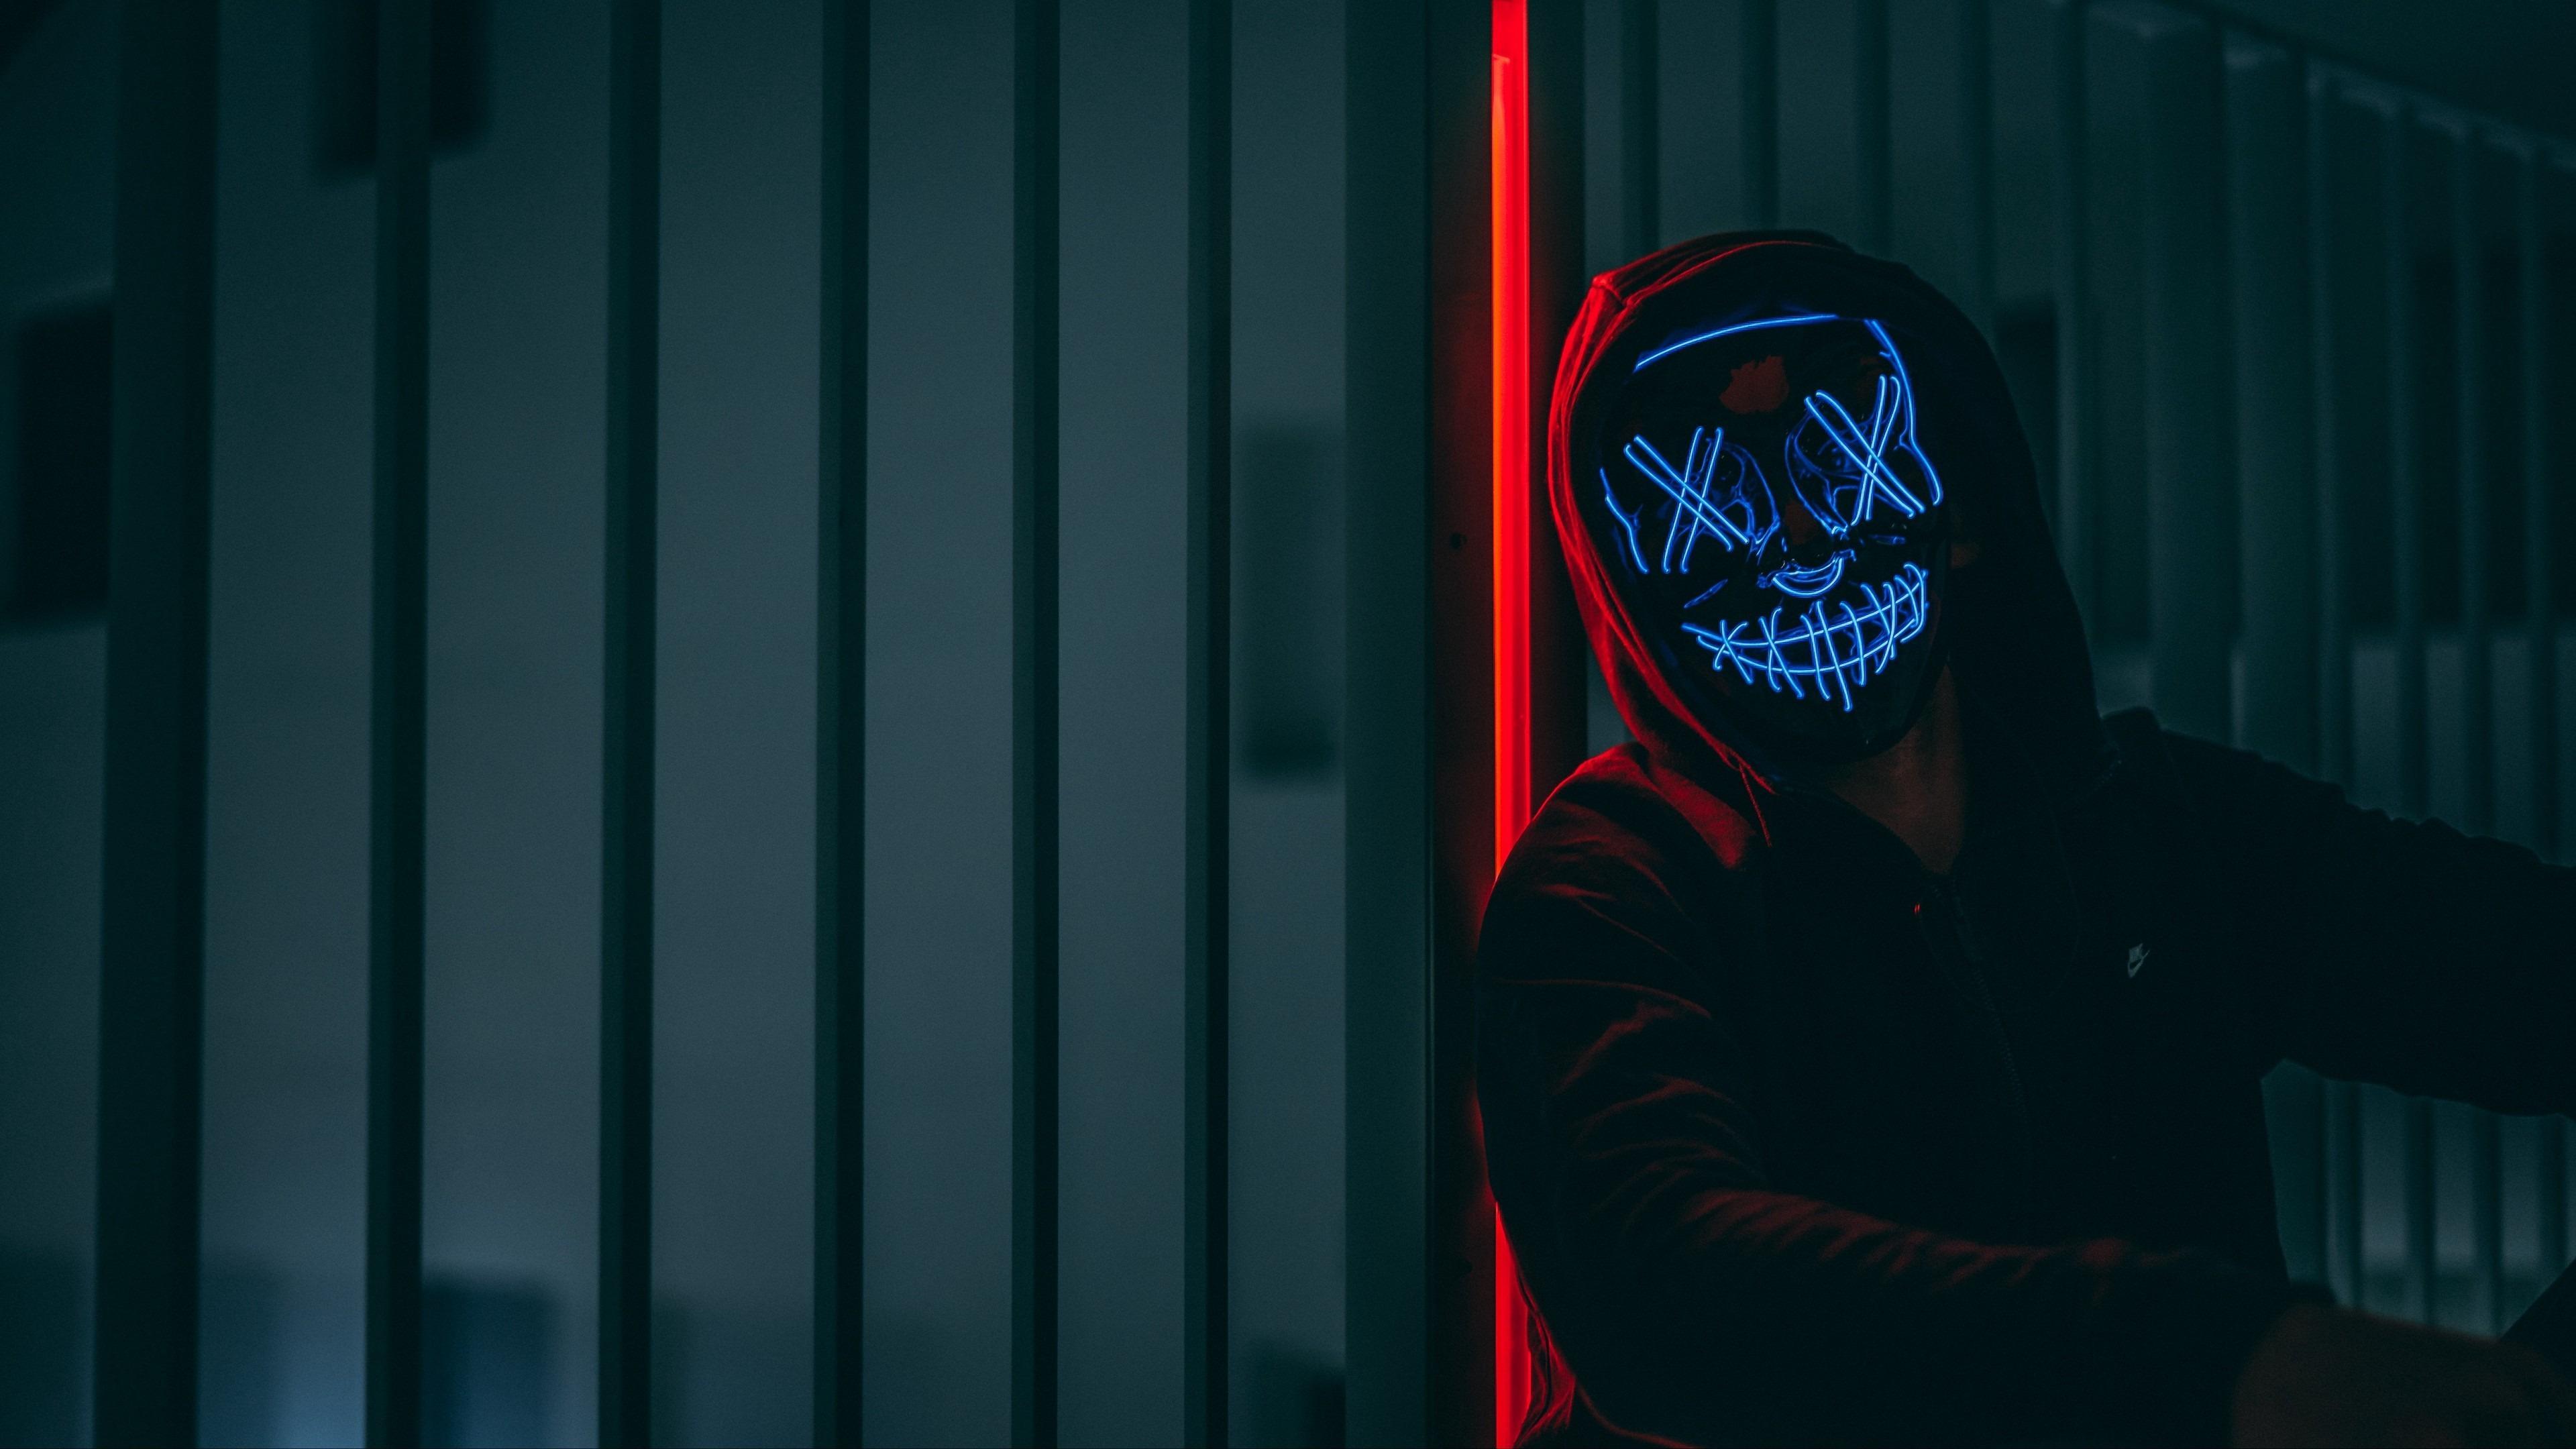 Neon masked guy wallpaper